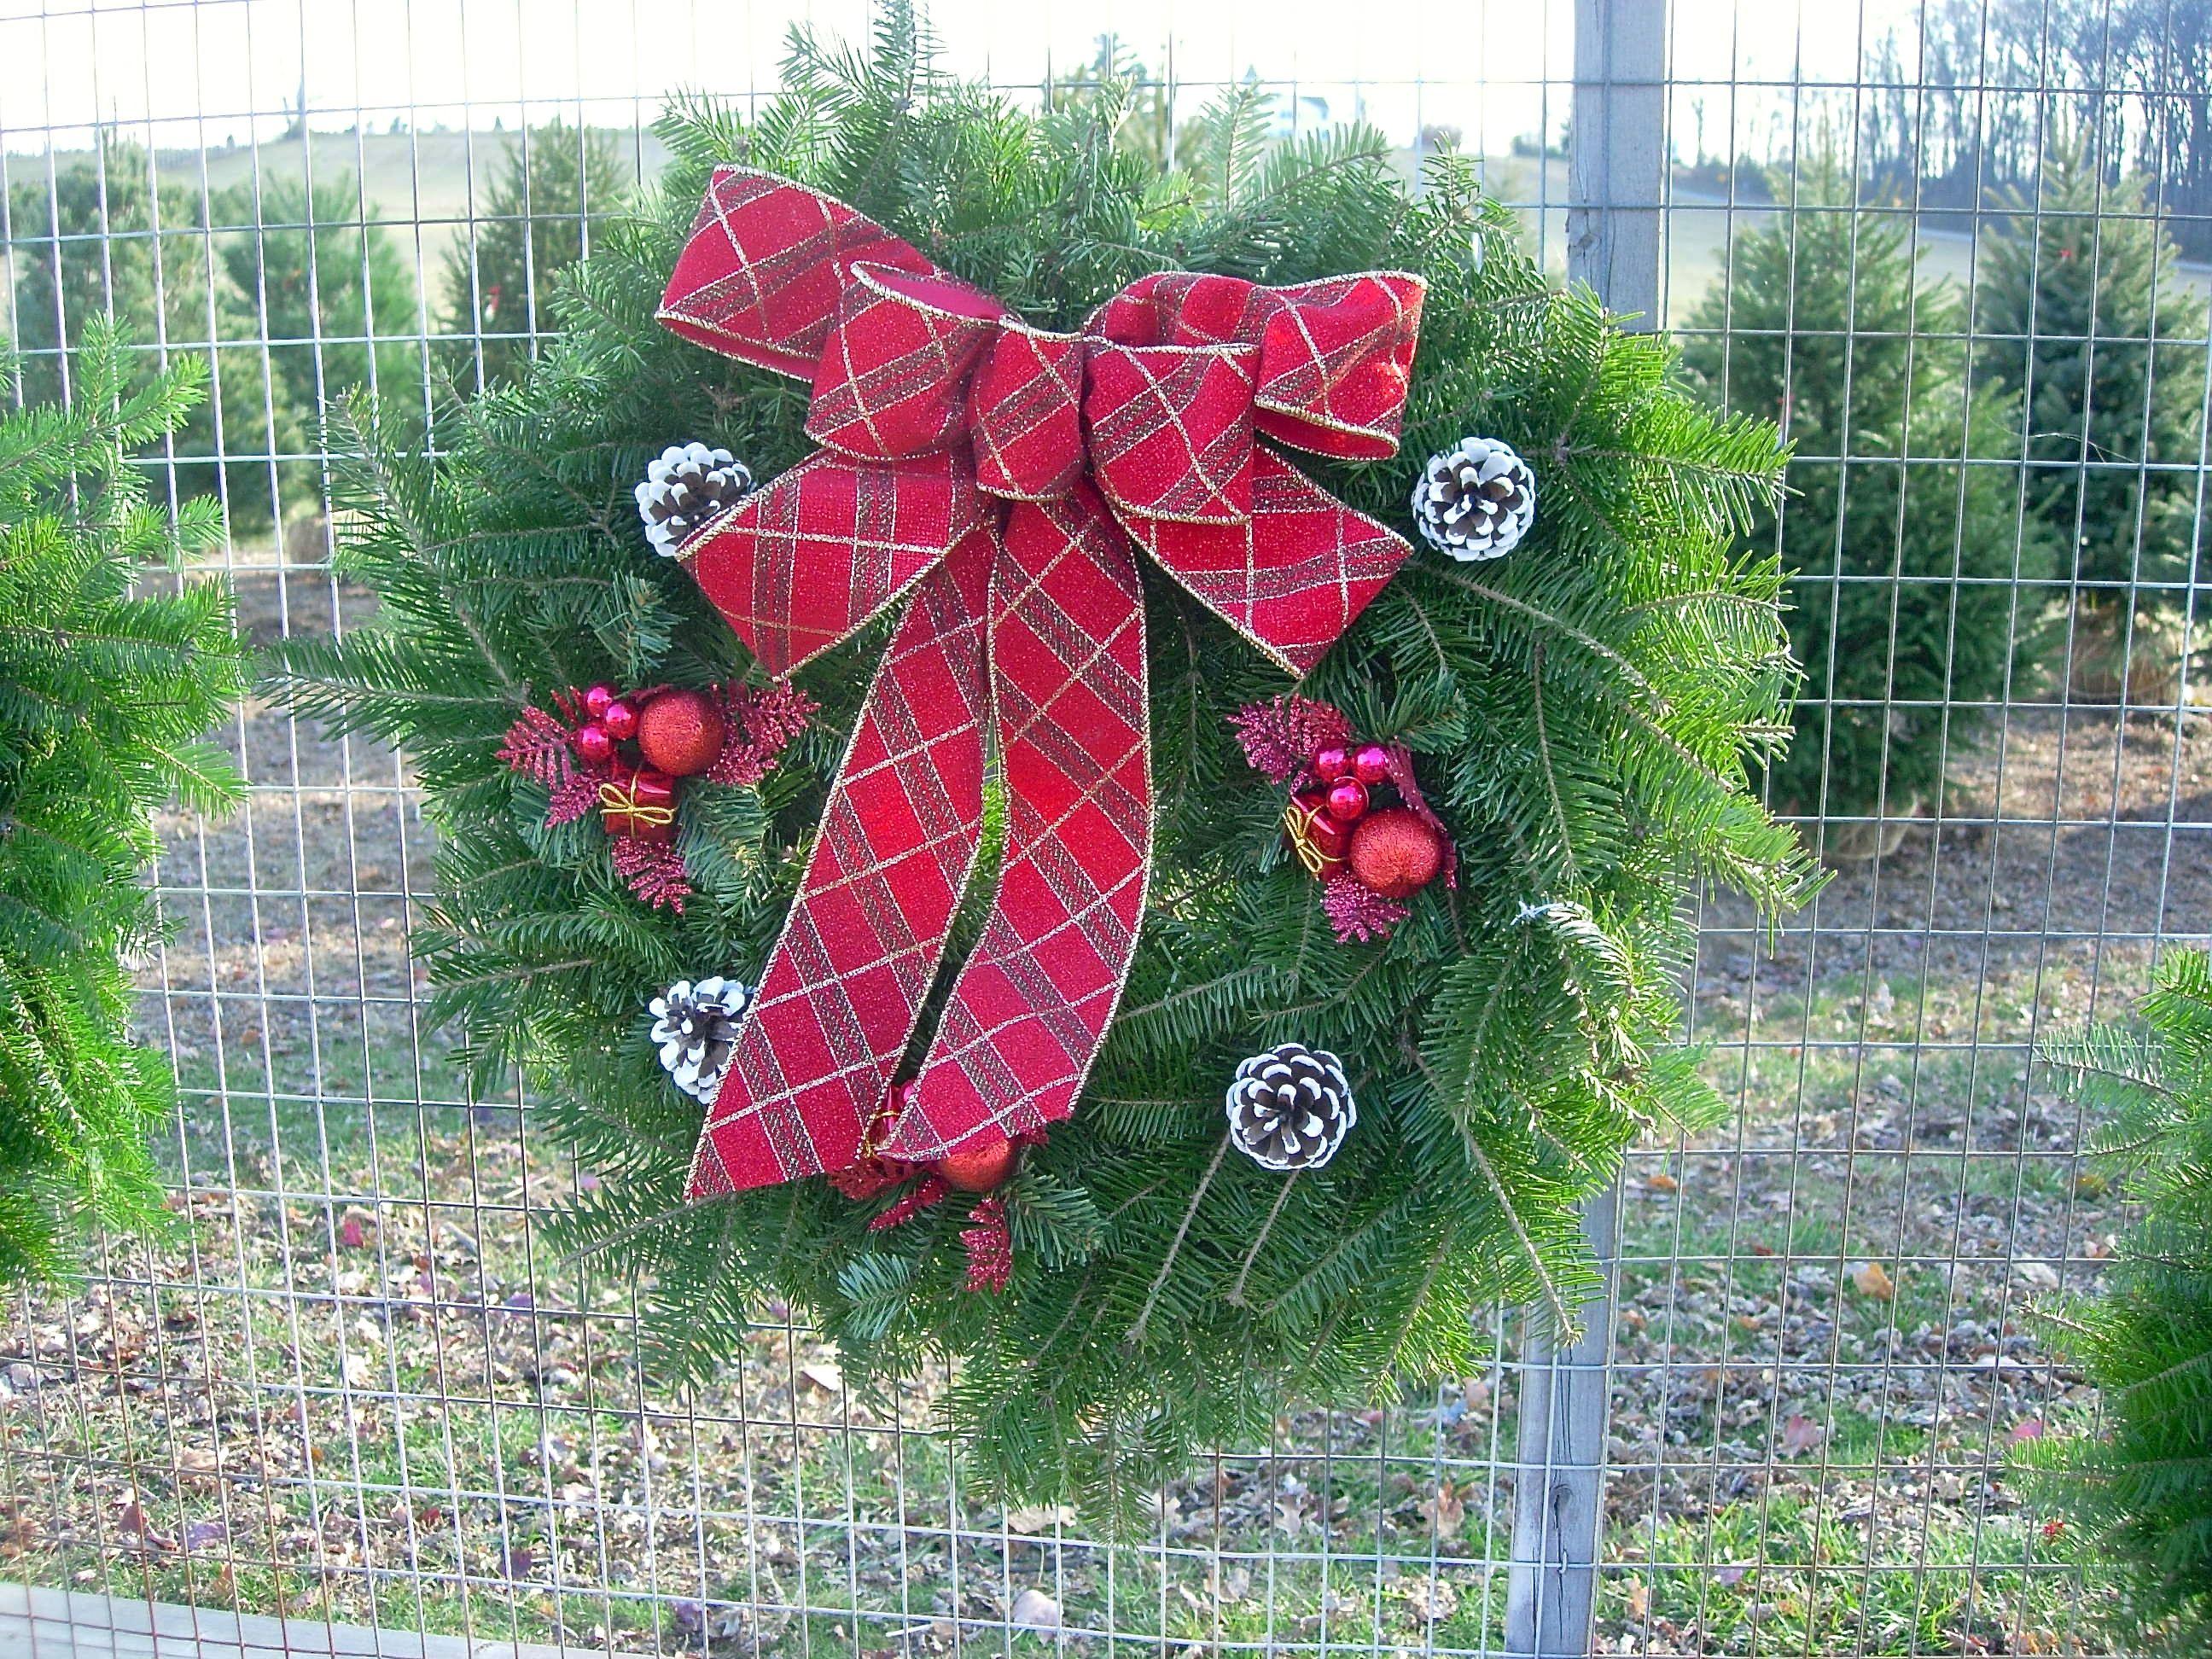 Wreaths   Bullock Farms - Cream Ridge, NJ